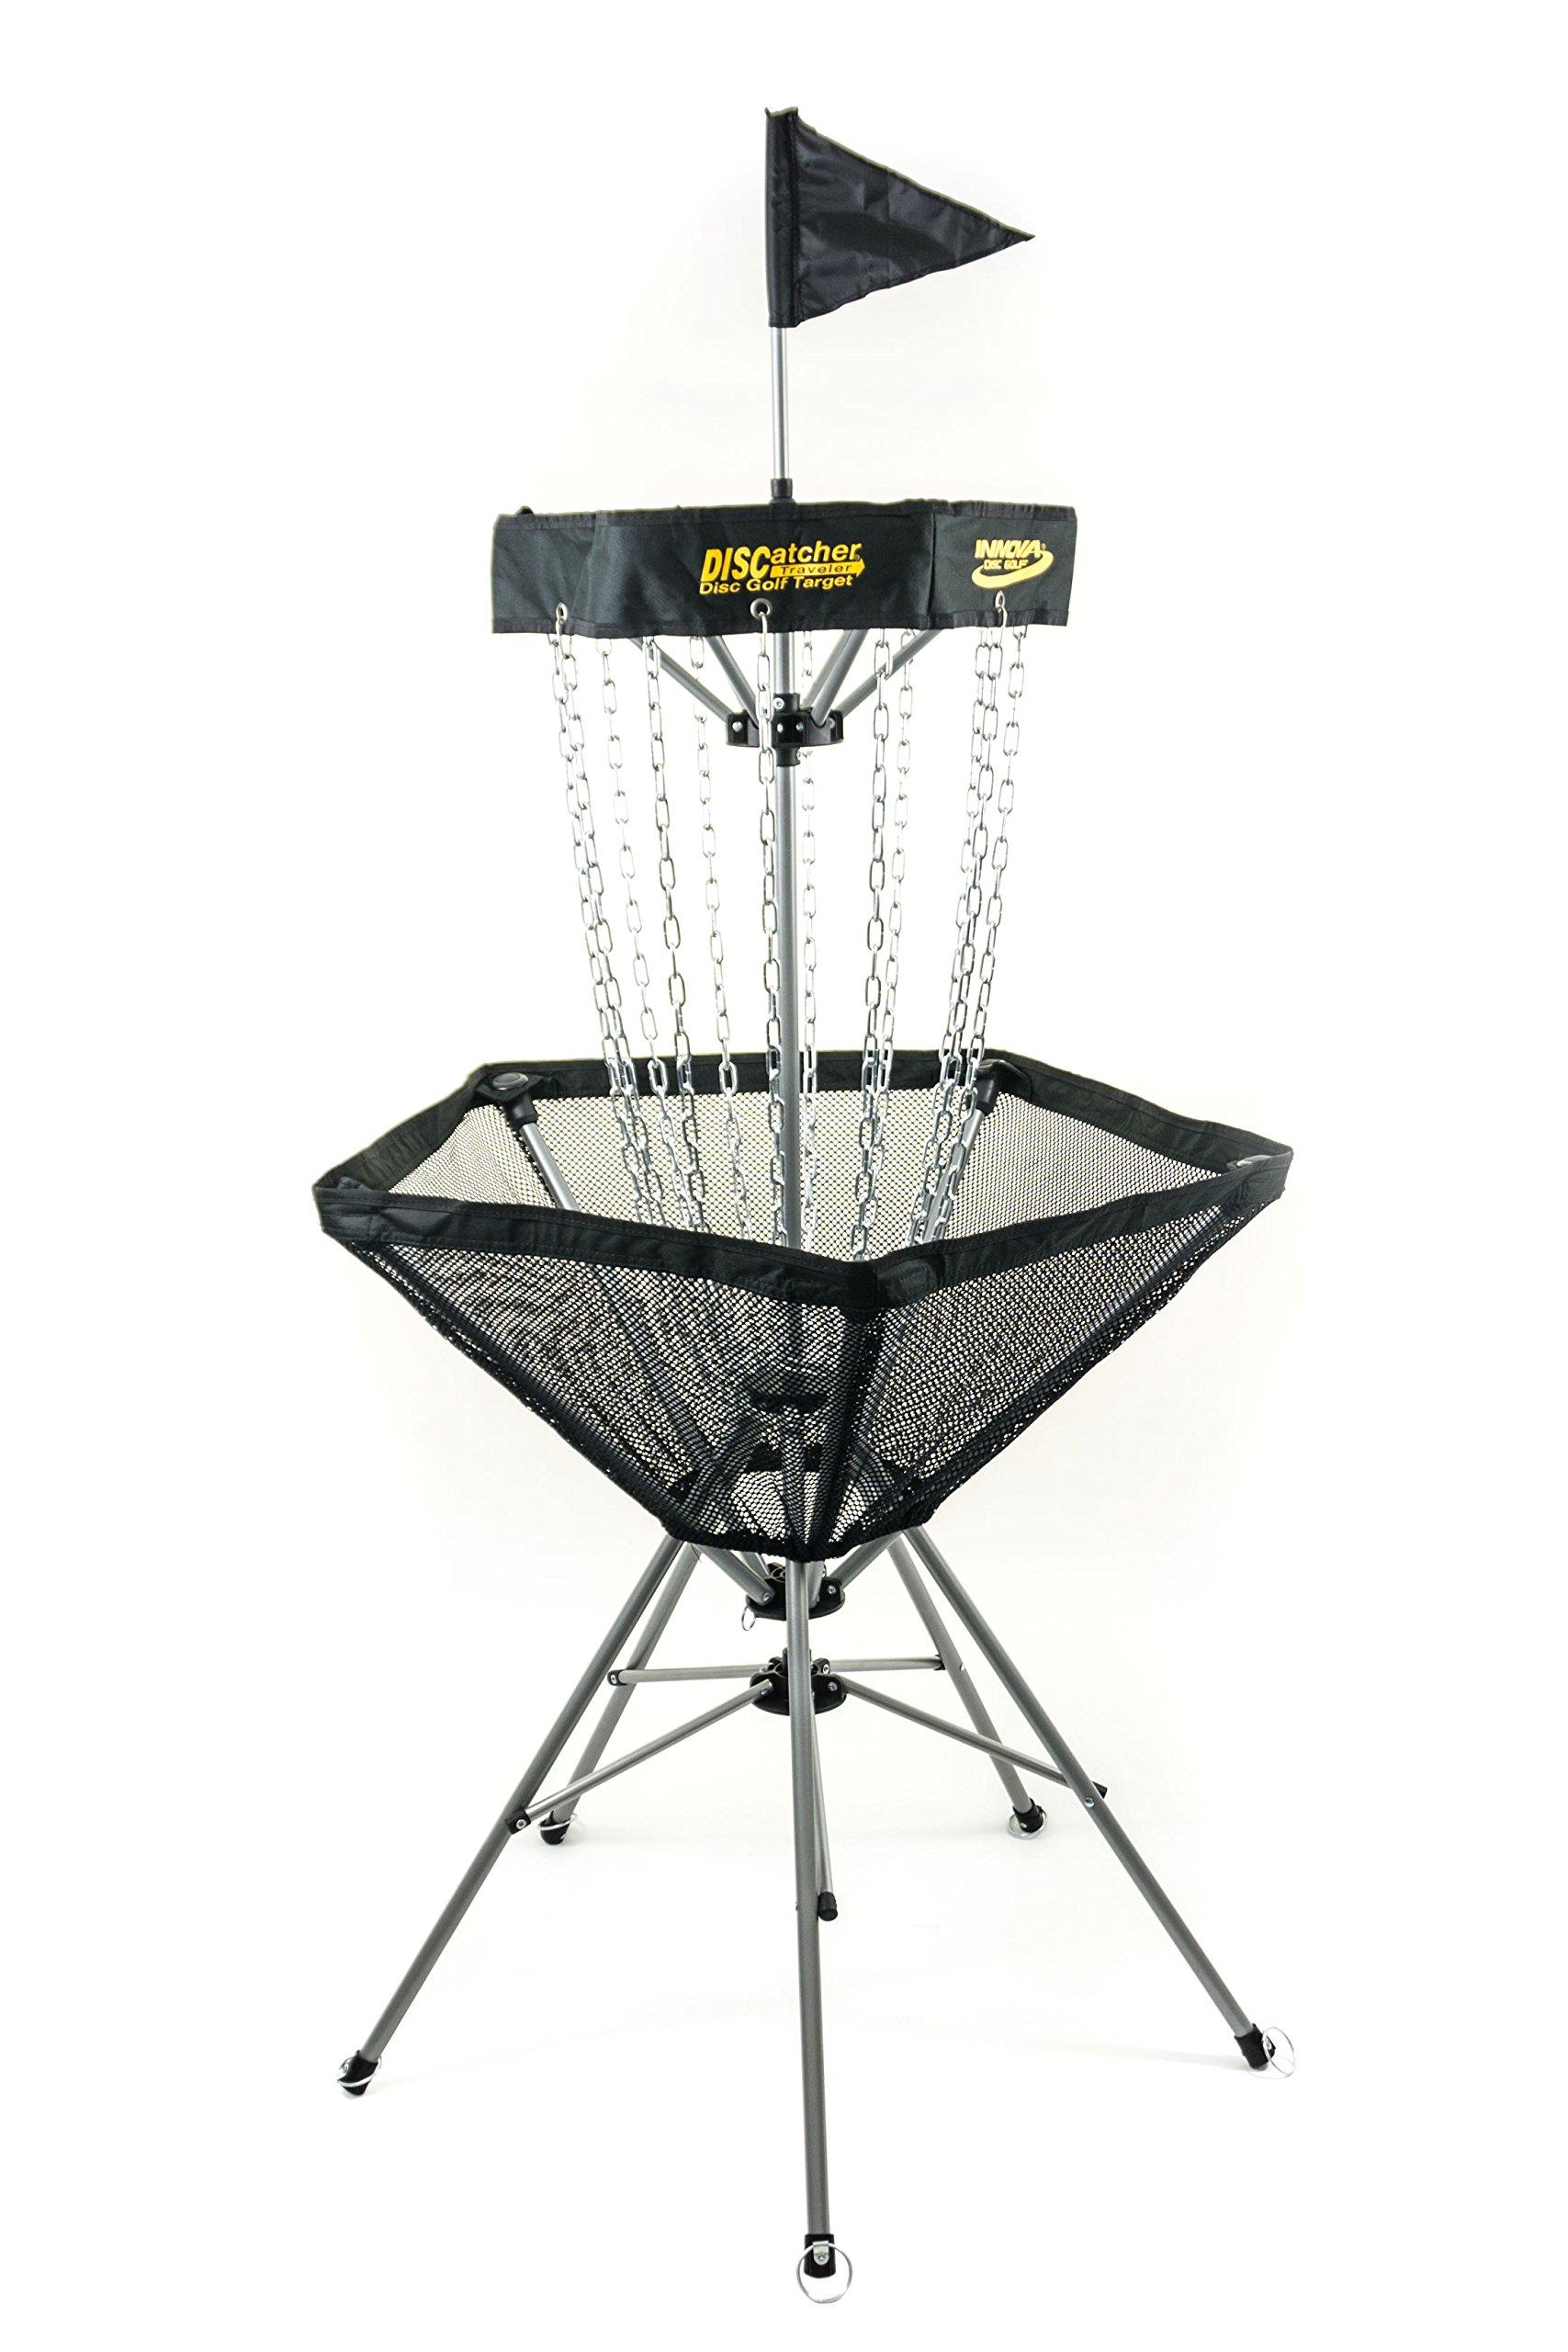 Innova Discatcher Traveler Basket - Black by Innova